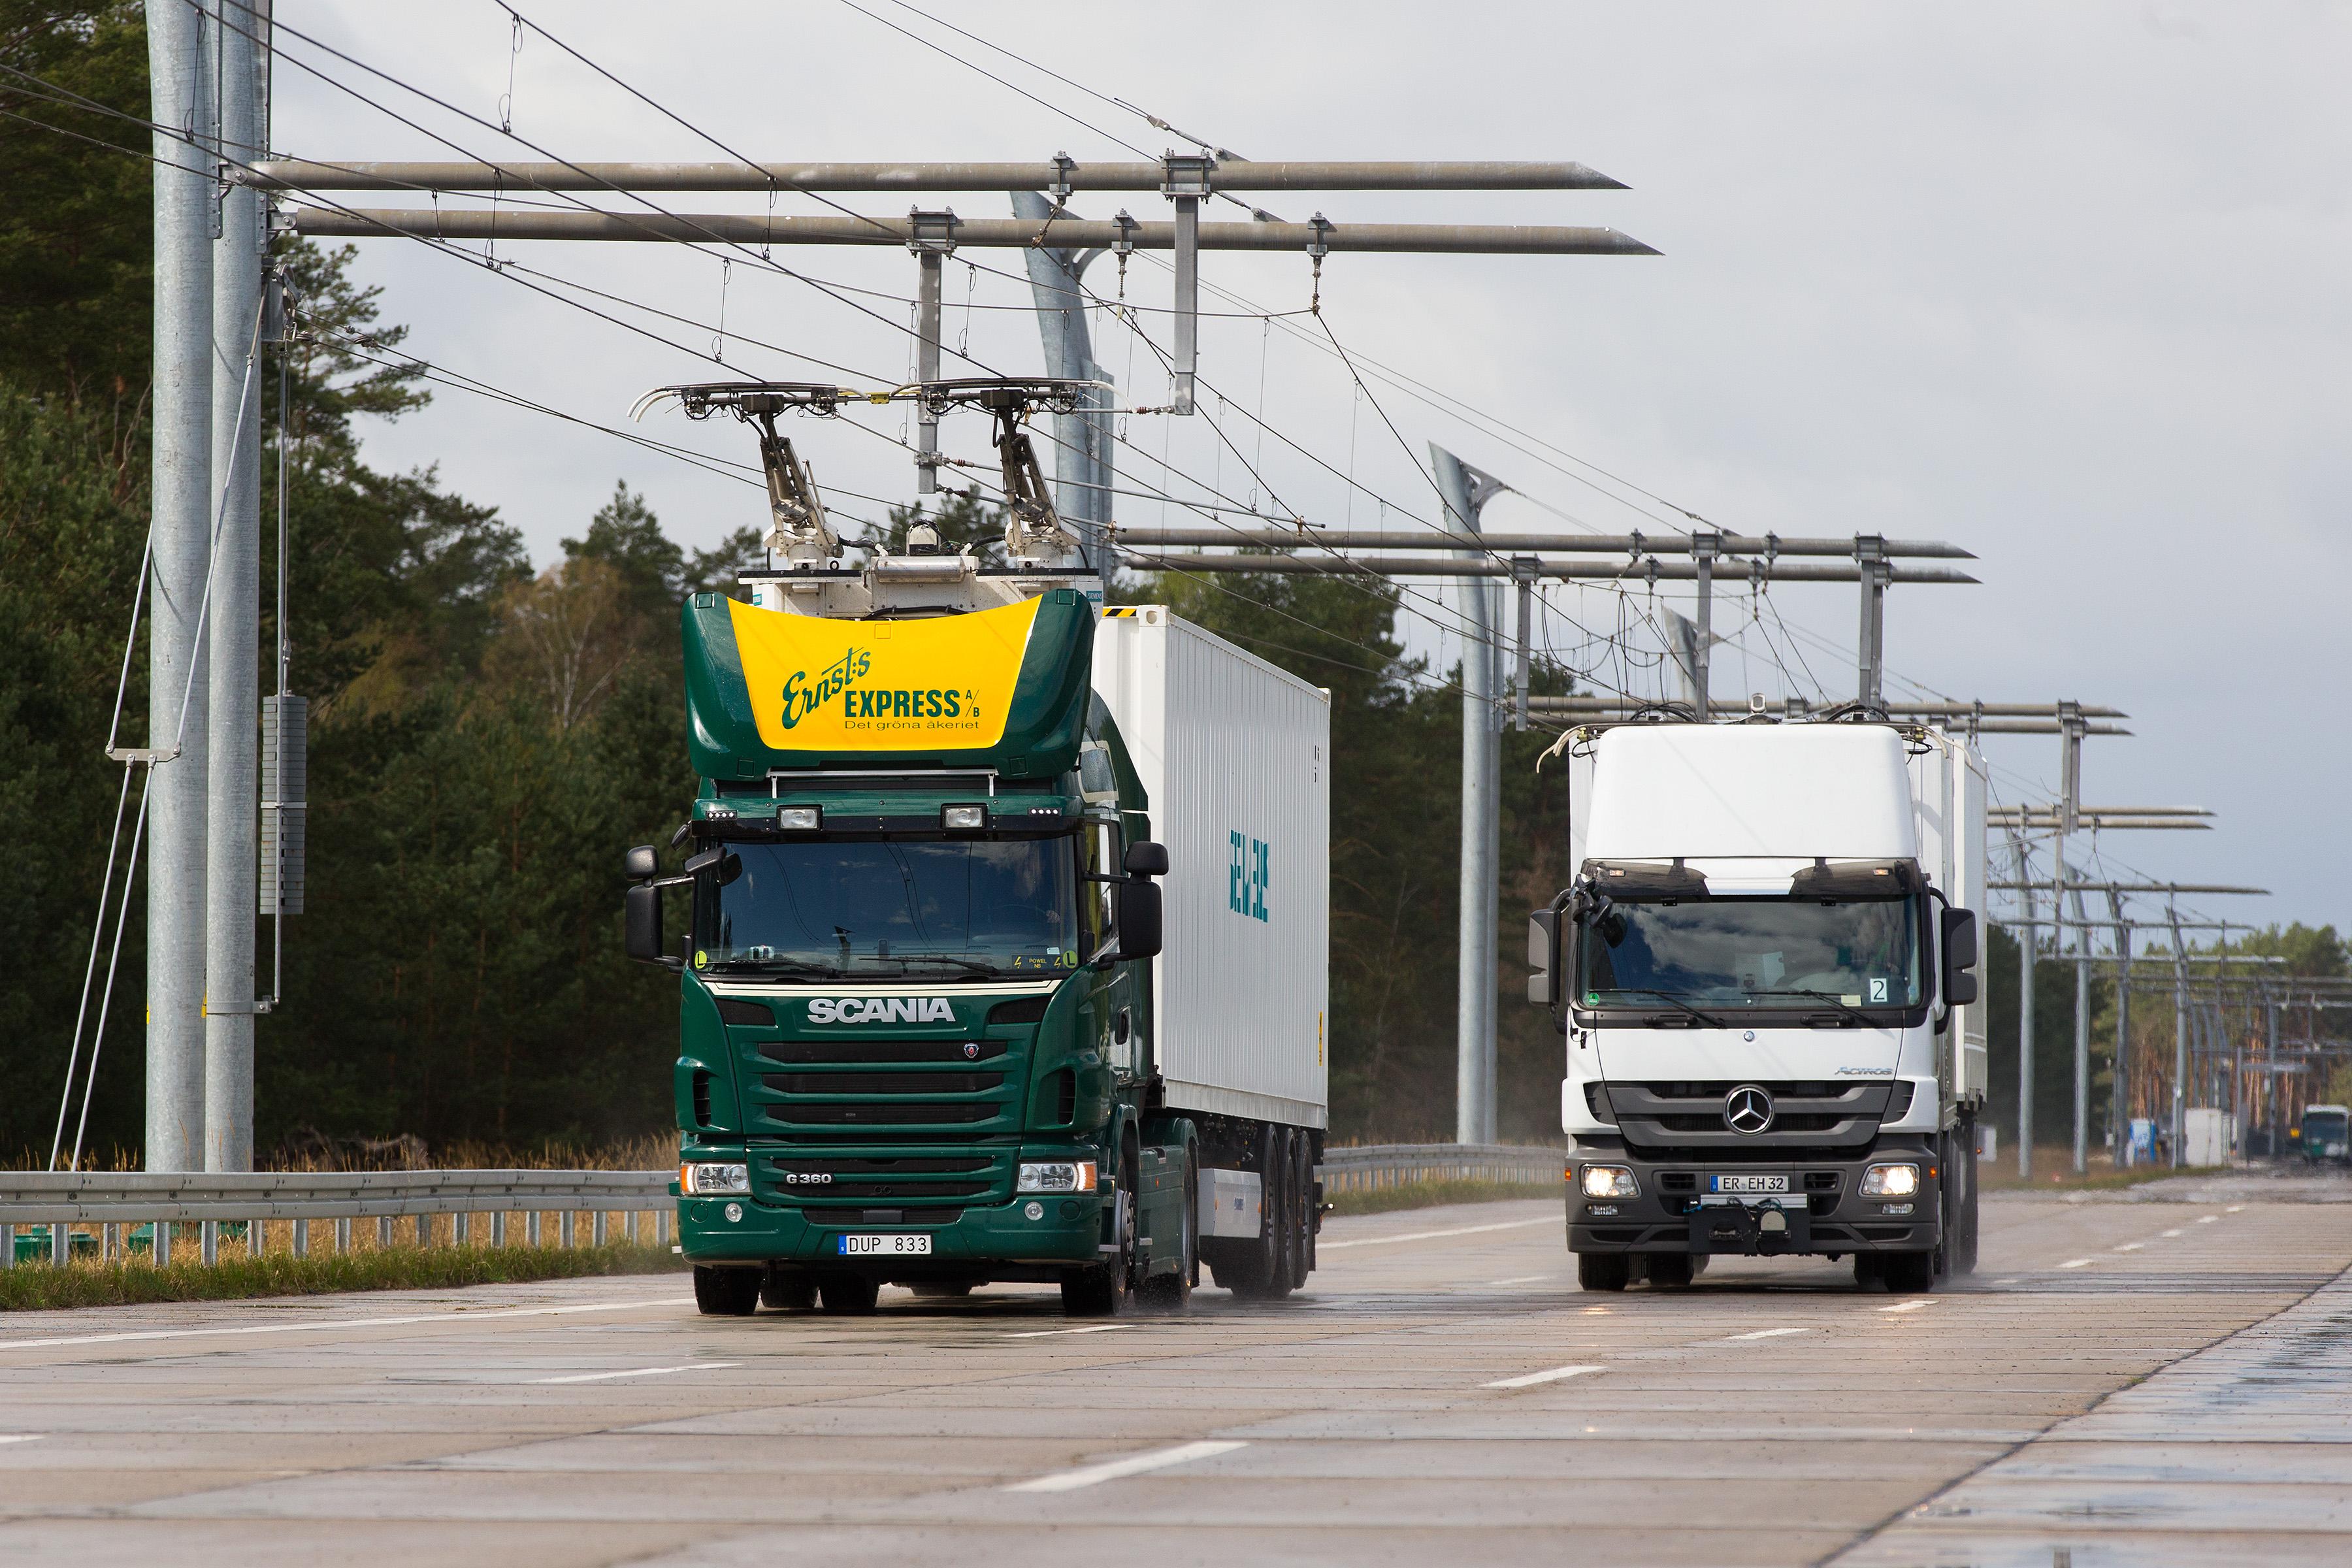 Siemens to Build eHighway Demo in Germany